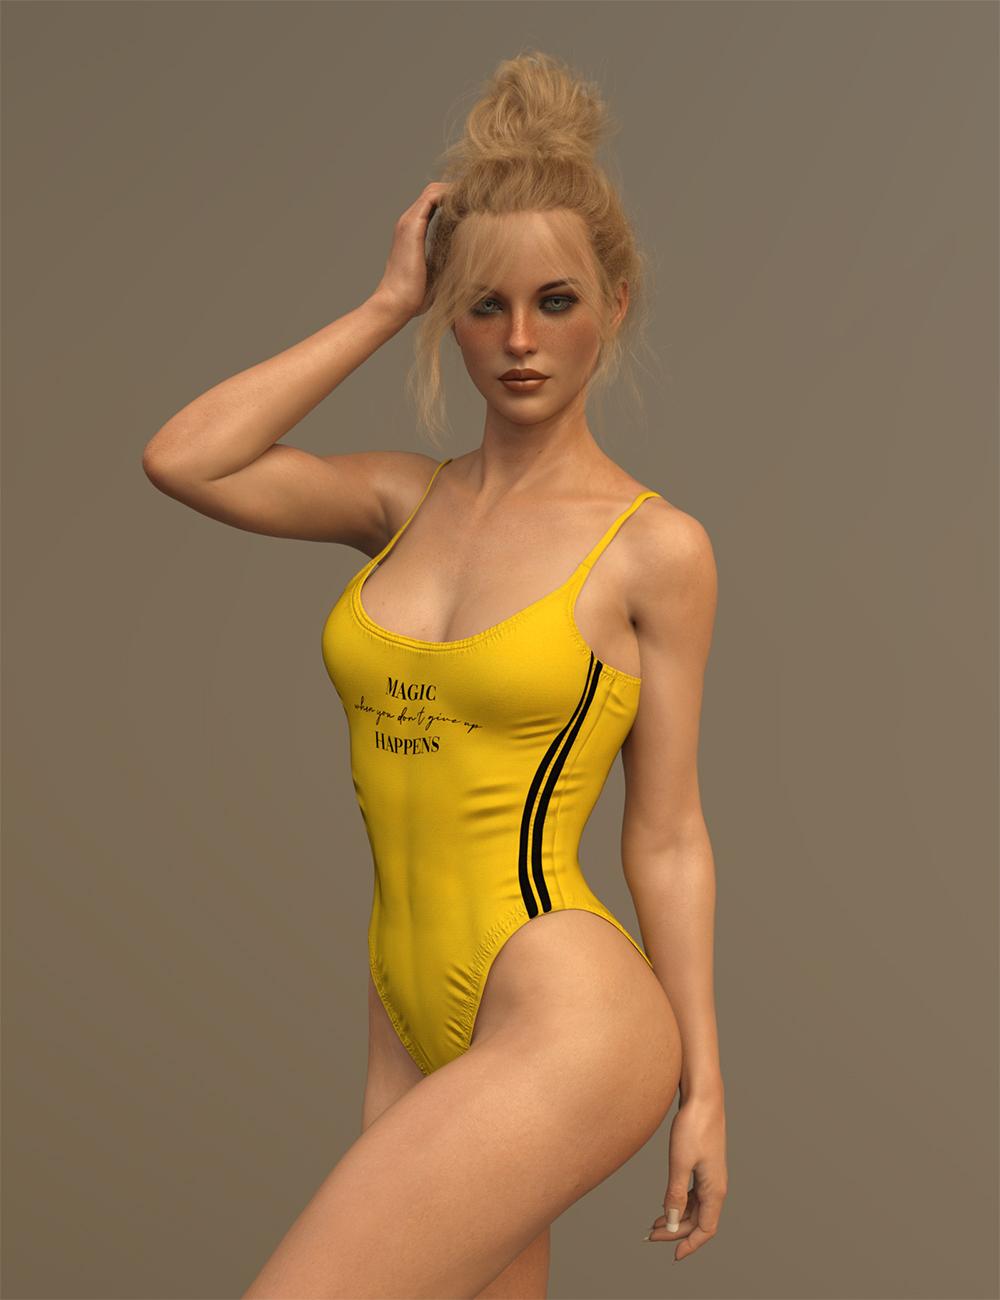 X-Fashion Inspire Bathsuit for Genesis 8 Female(s) by: xtrart-3d, 3D Models by Daz 3D